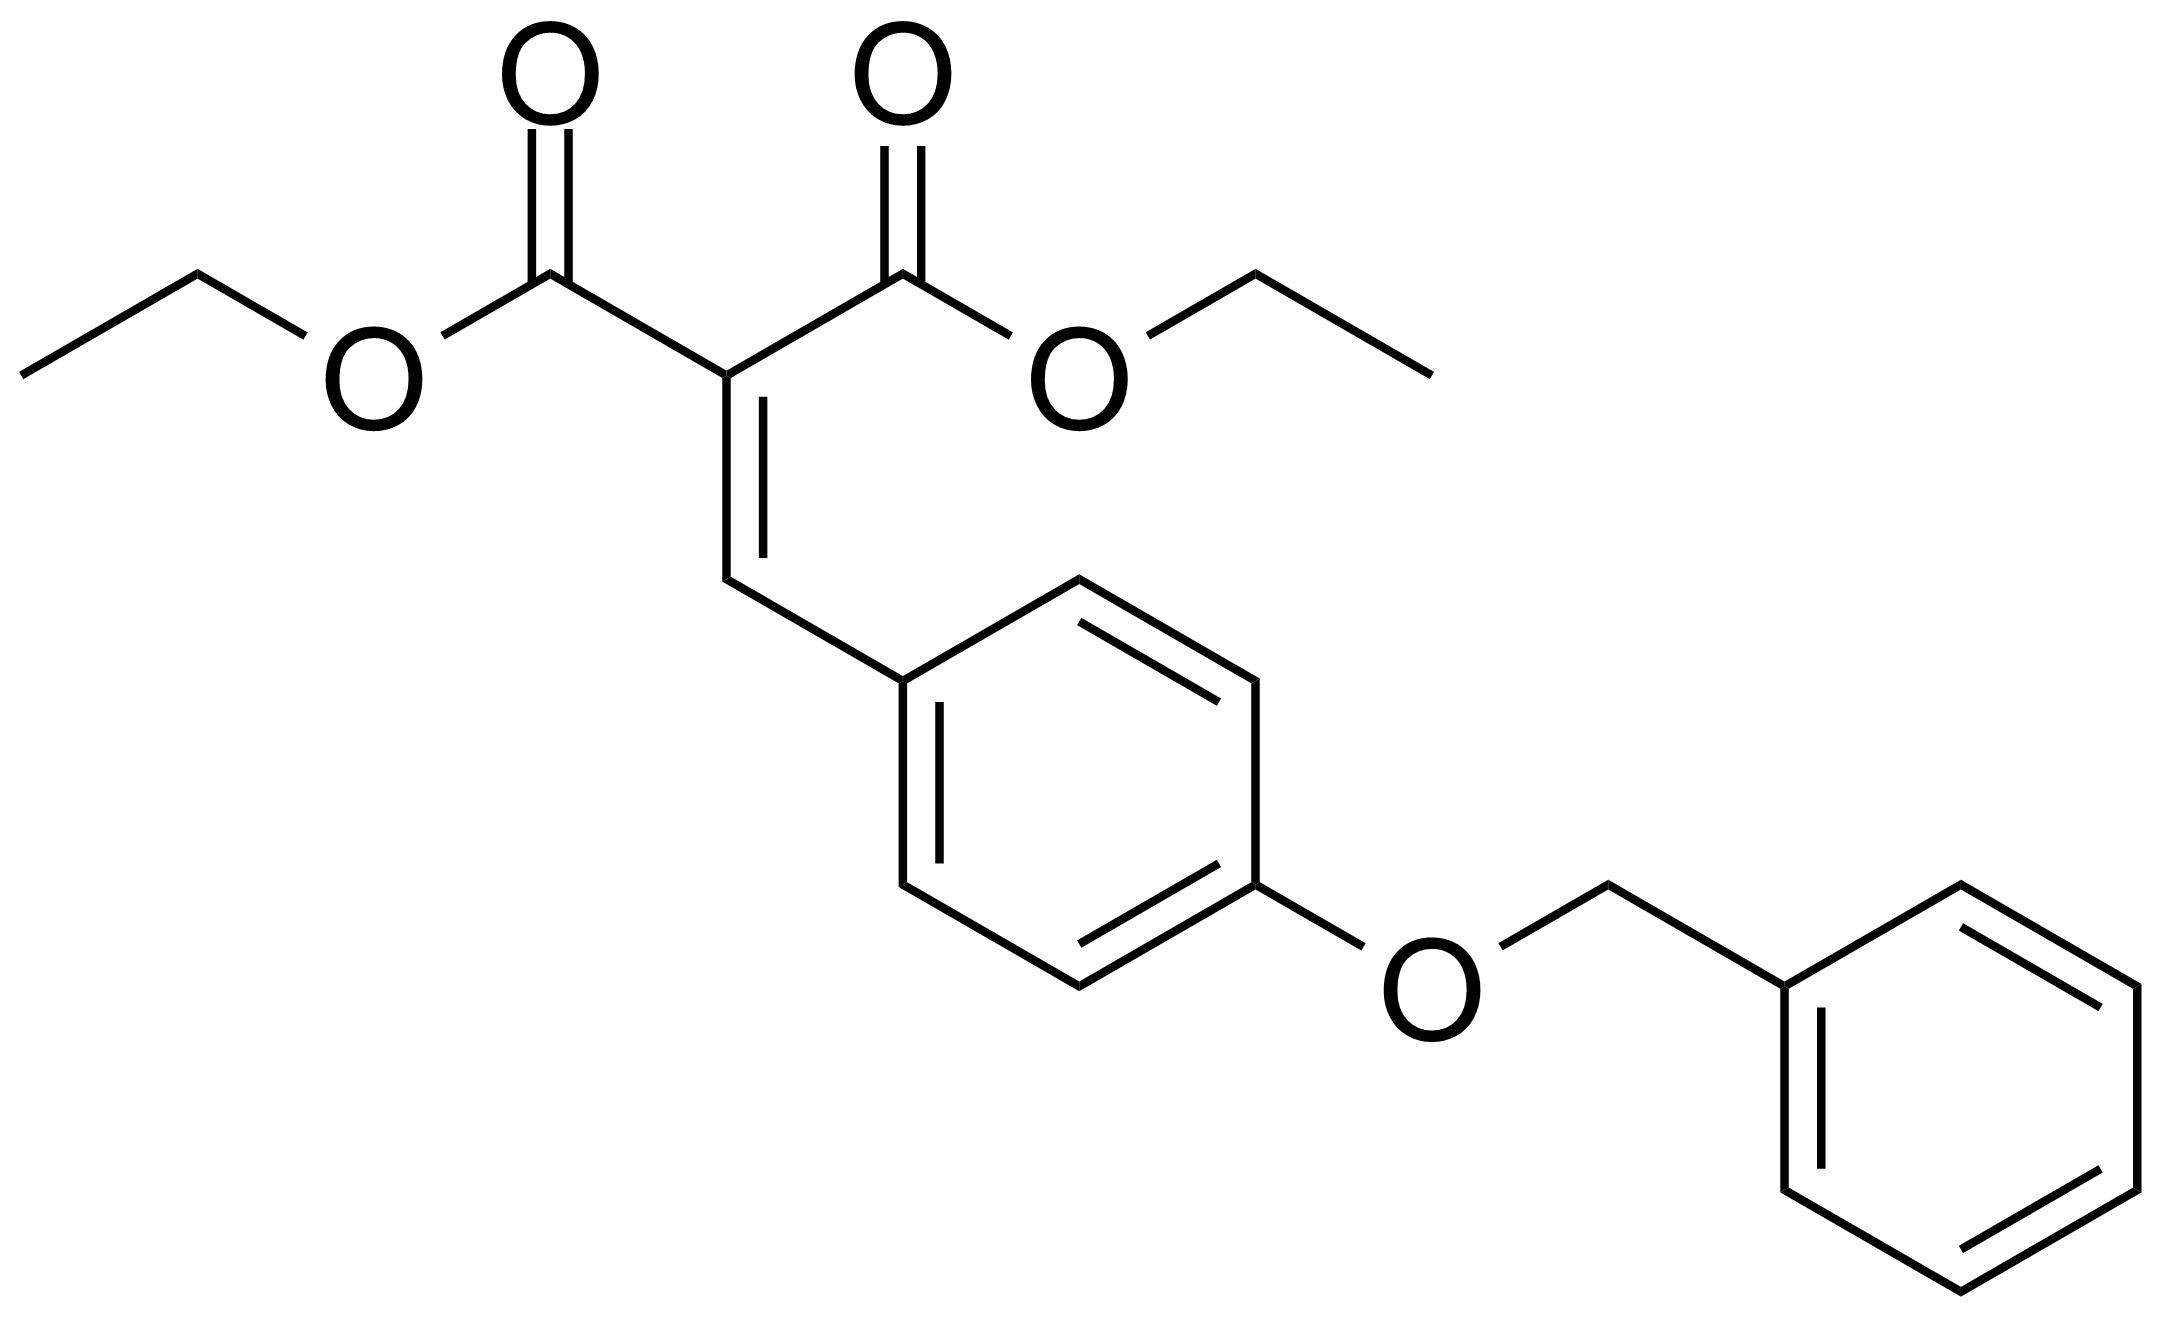 Structure of Diethyl 2-[4-(benzyloxy)benzylidene]malonate